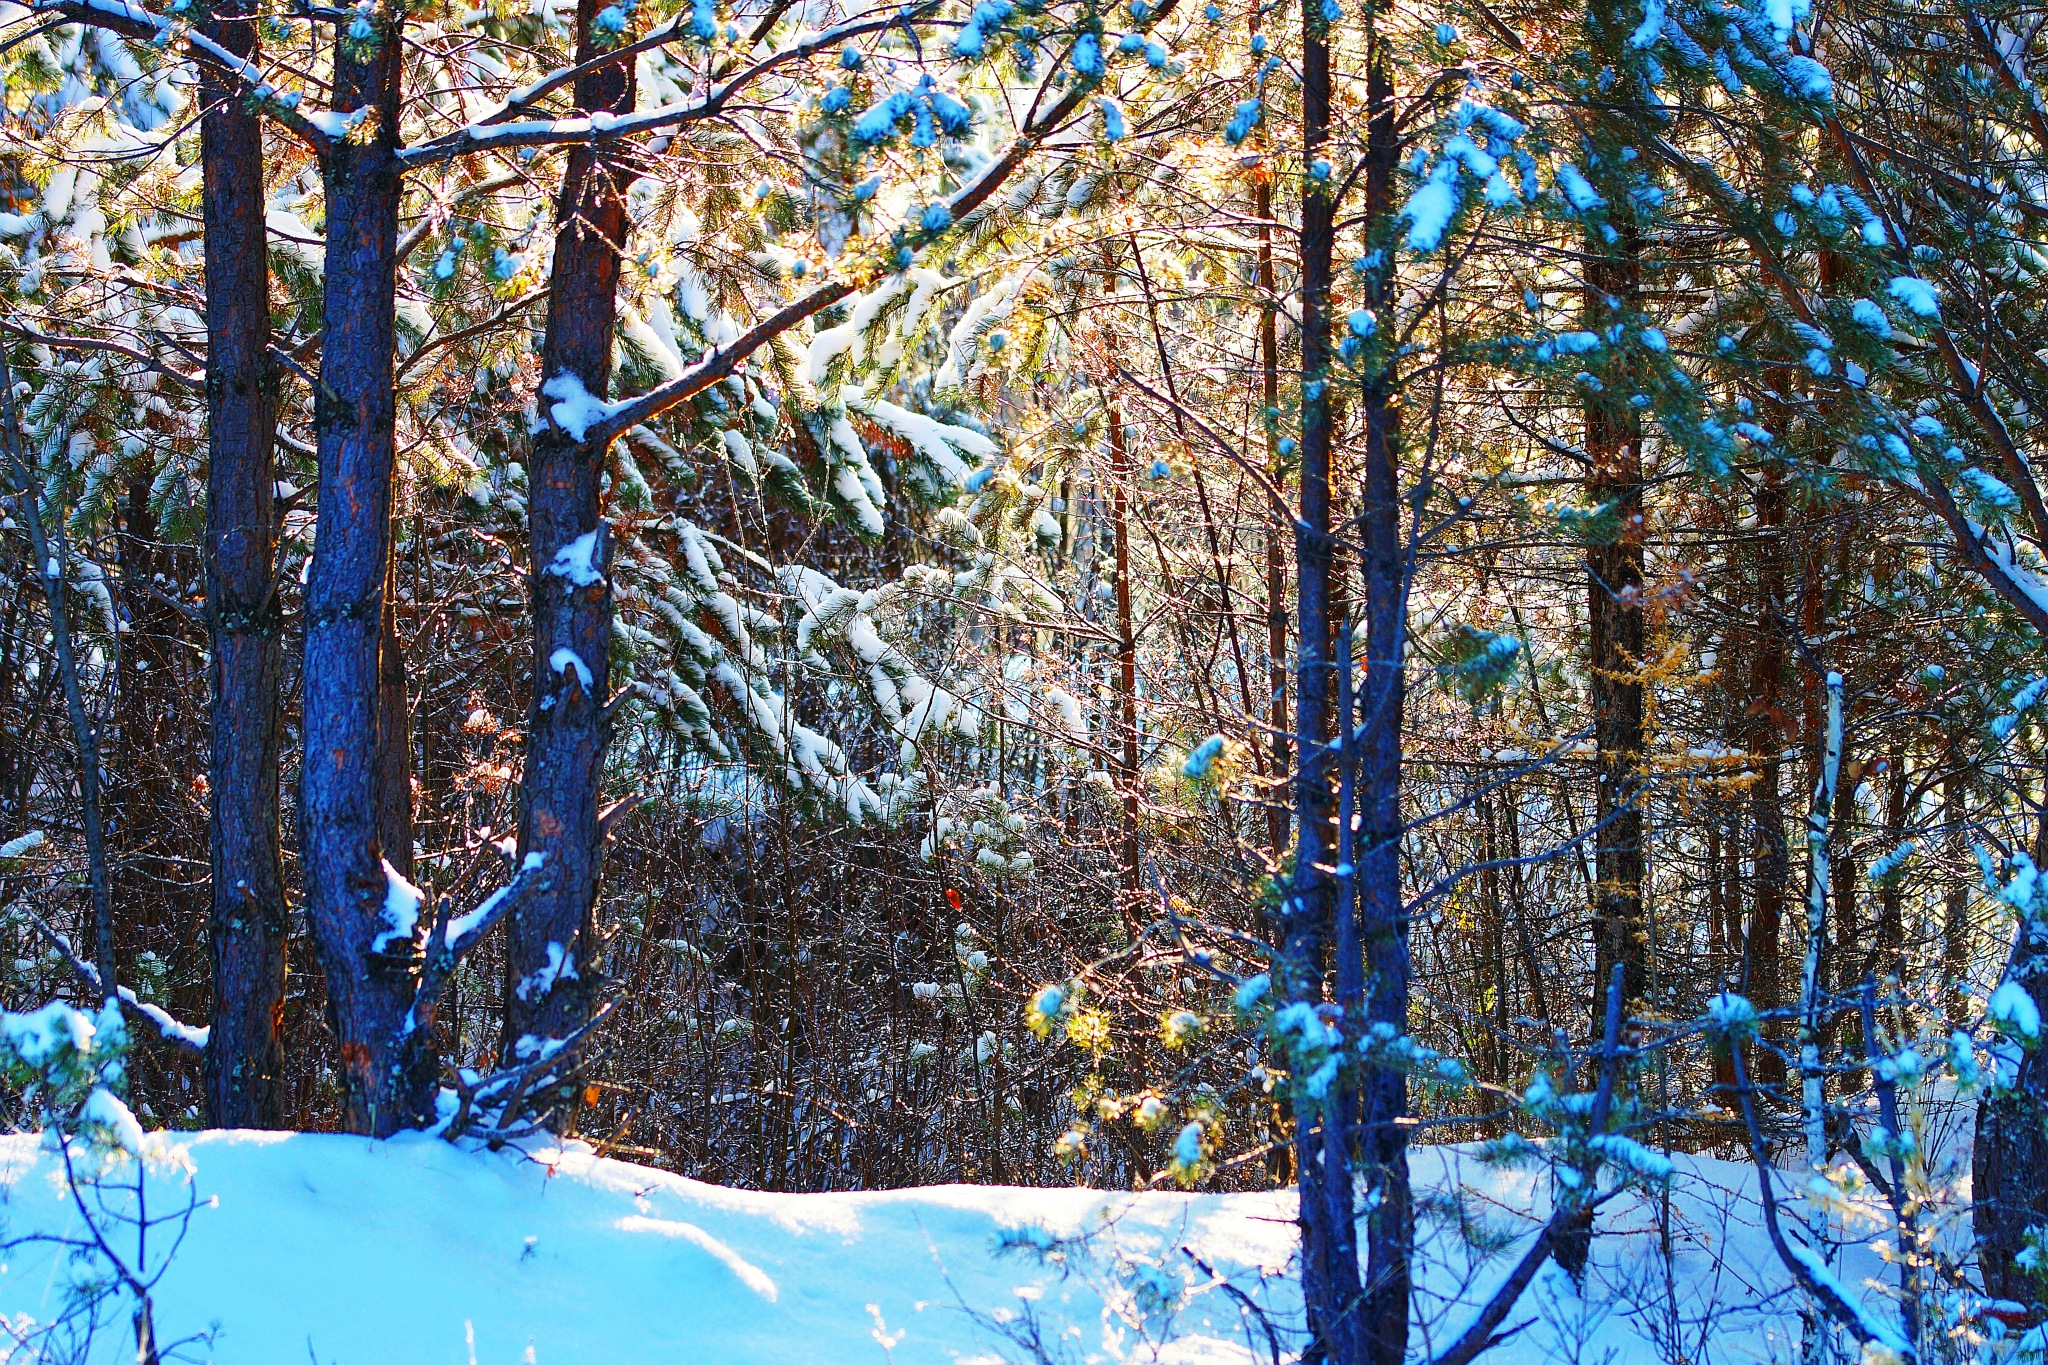 November Wood by sergey.parfeniuk